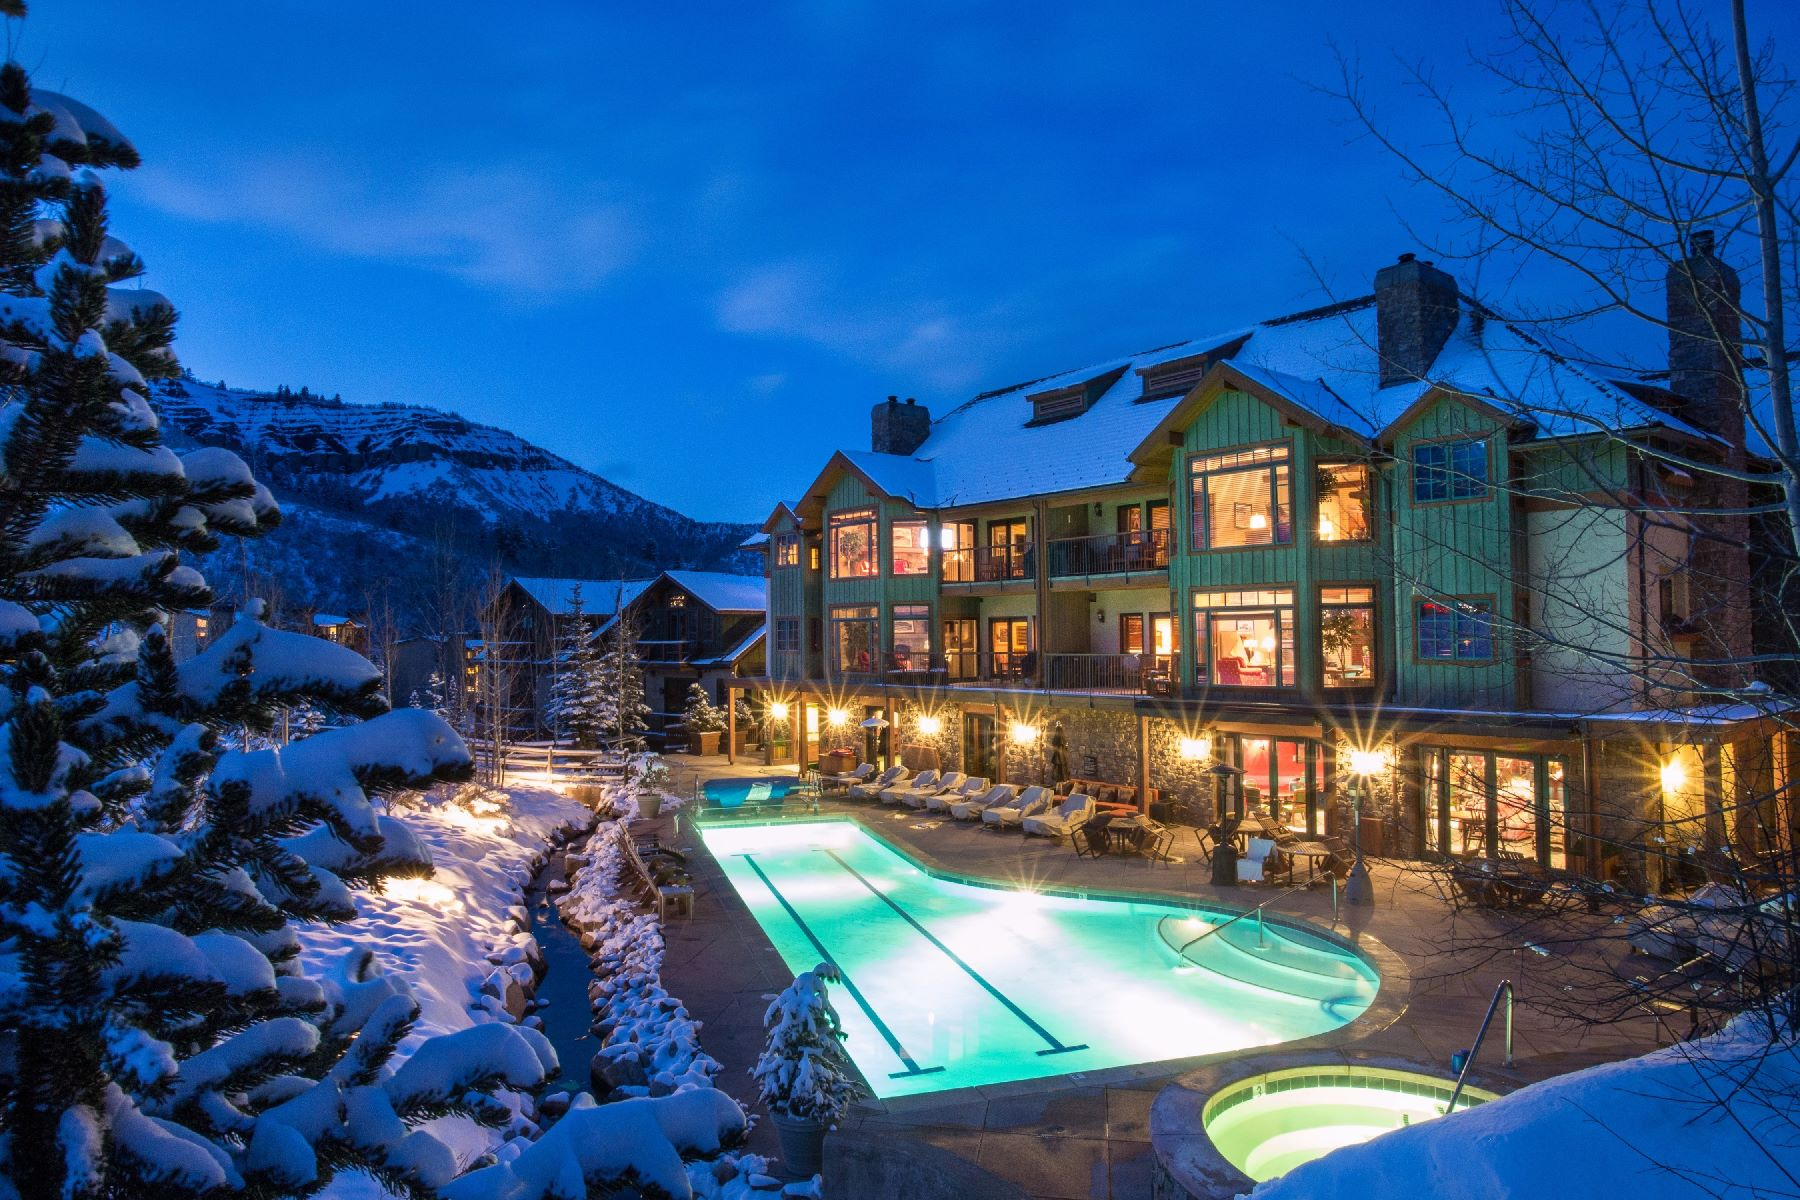 Property для того Продажа на 065 Timbers Club Court, B2-VI, Snowmass Village, Колорадо 81615 Соединенные Штаты